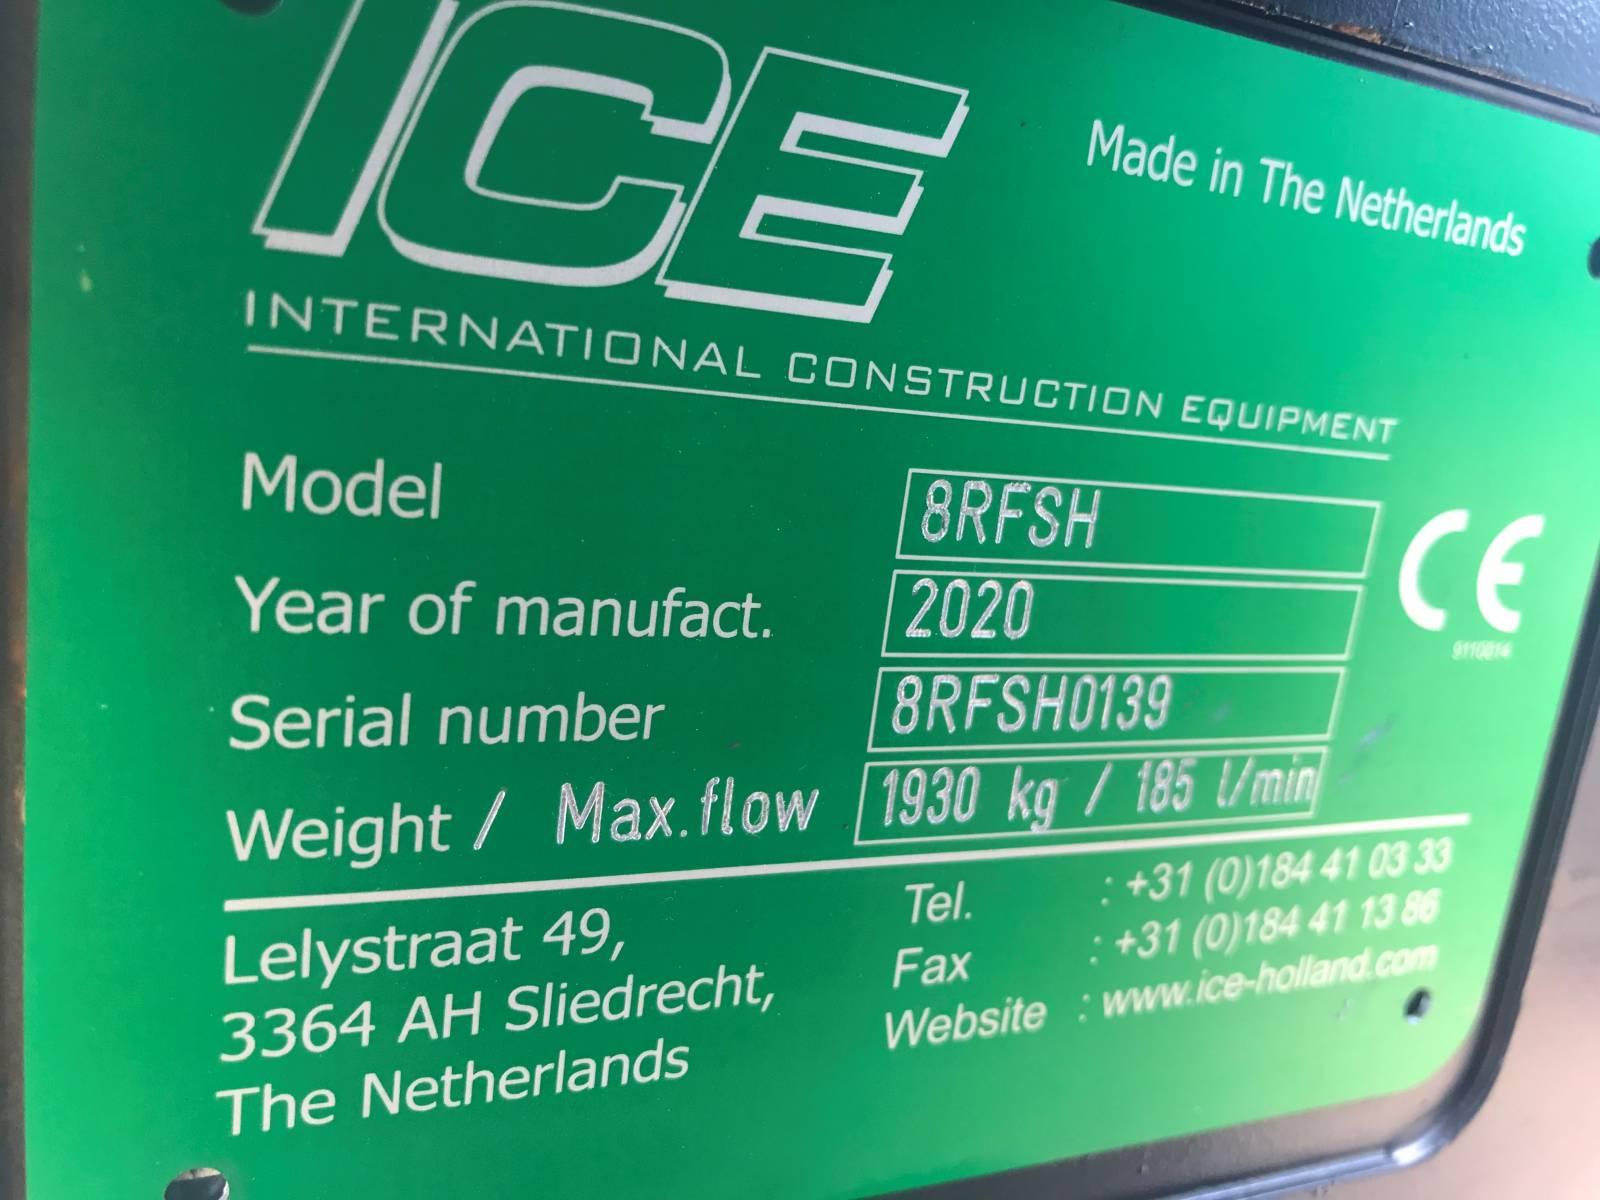 NEW ICE 8RFSH VIBRATORY HAMMER